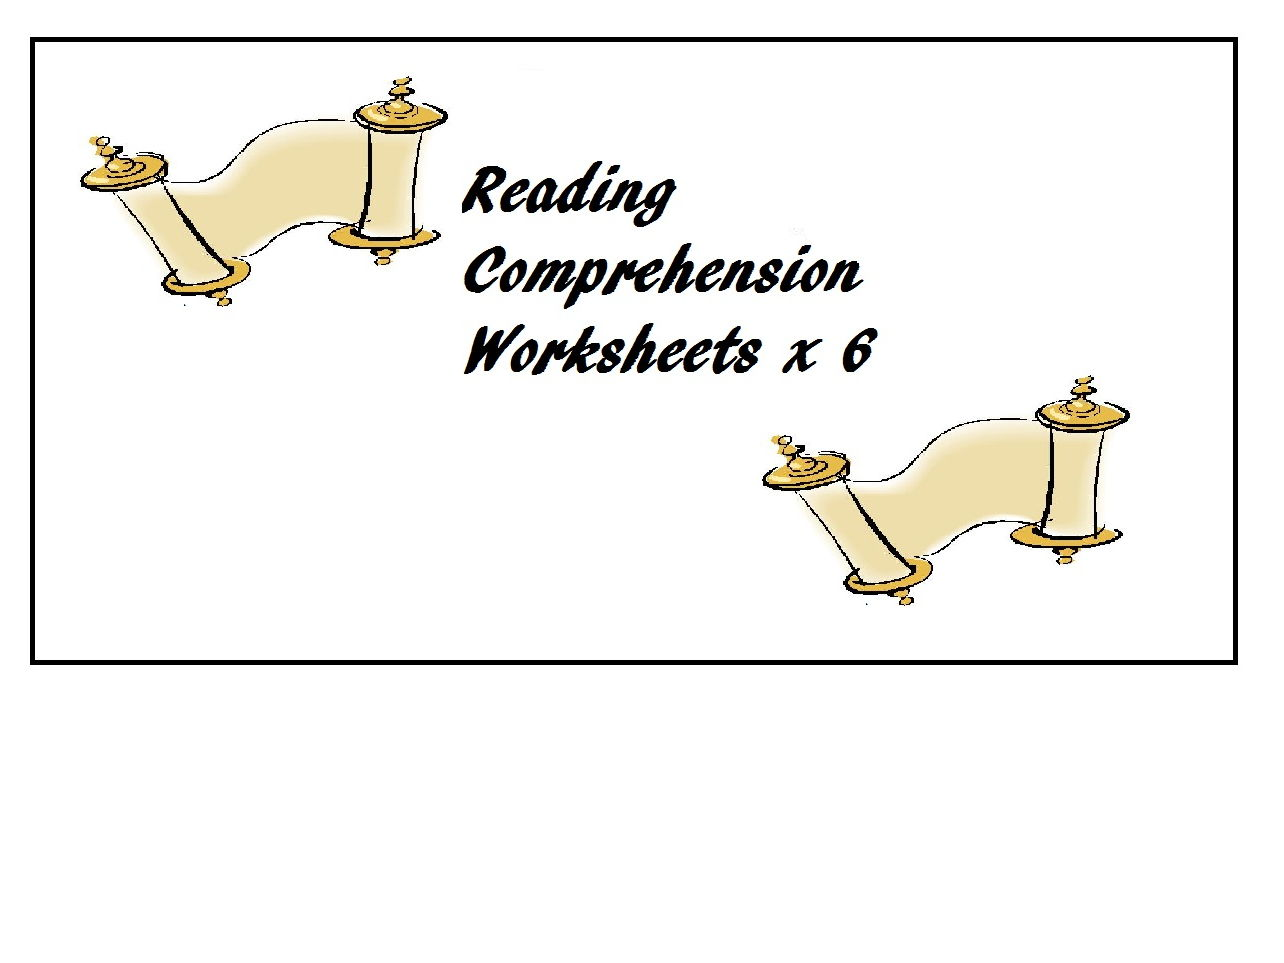 Reading Comprehension Worksheets X 6 60 Off